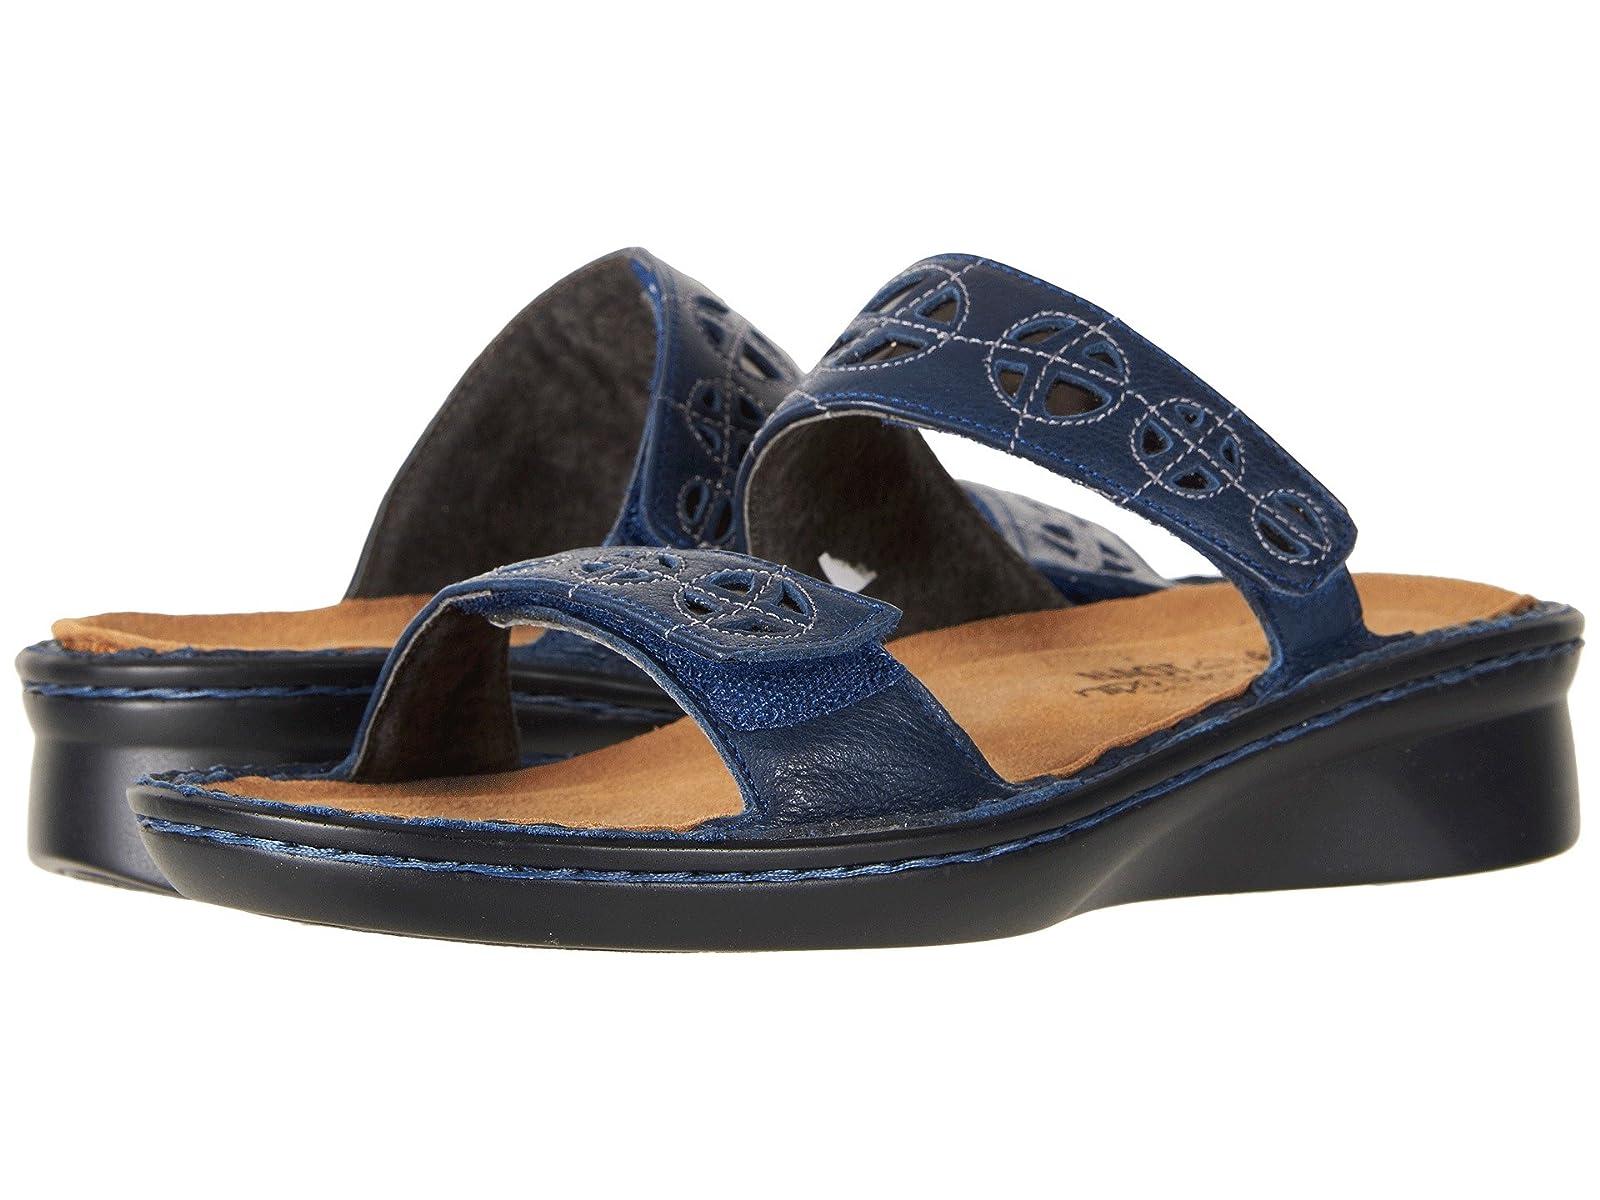 Naot CornetAtmospheric grades have affordable shoes